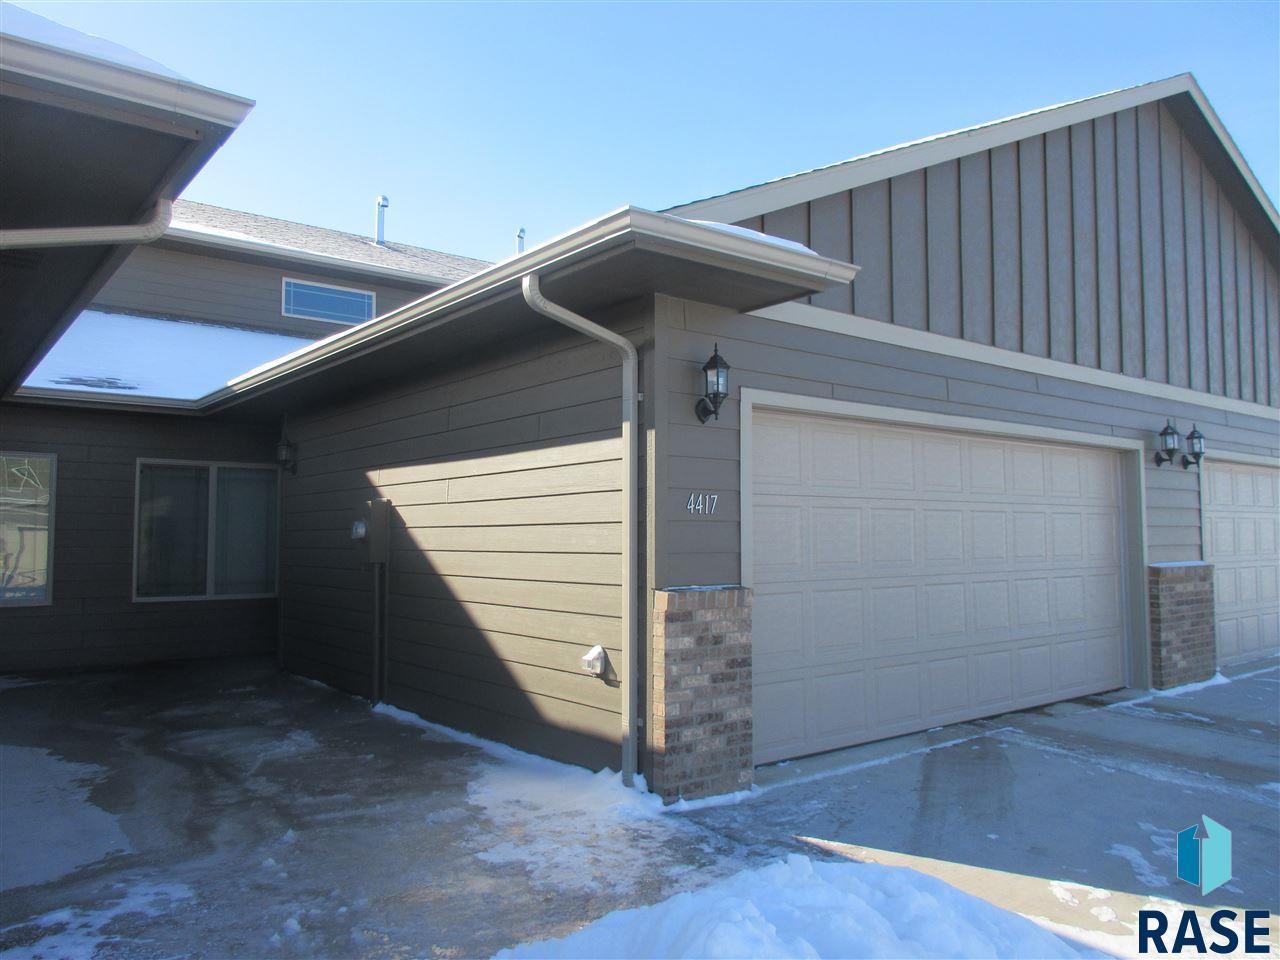 falls doors vineyard garage sandness mentele property sioux sd s team ave